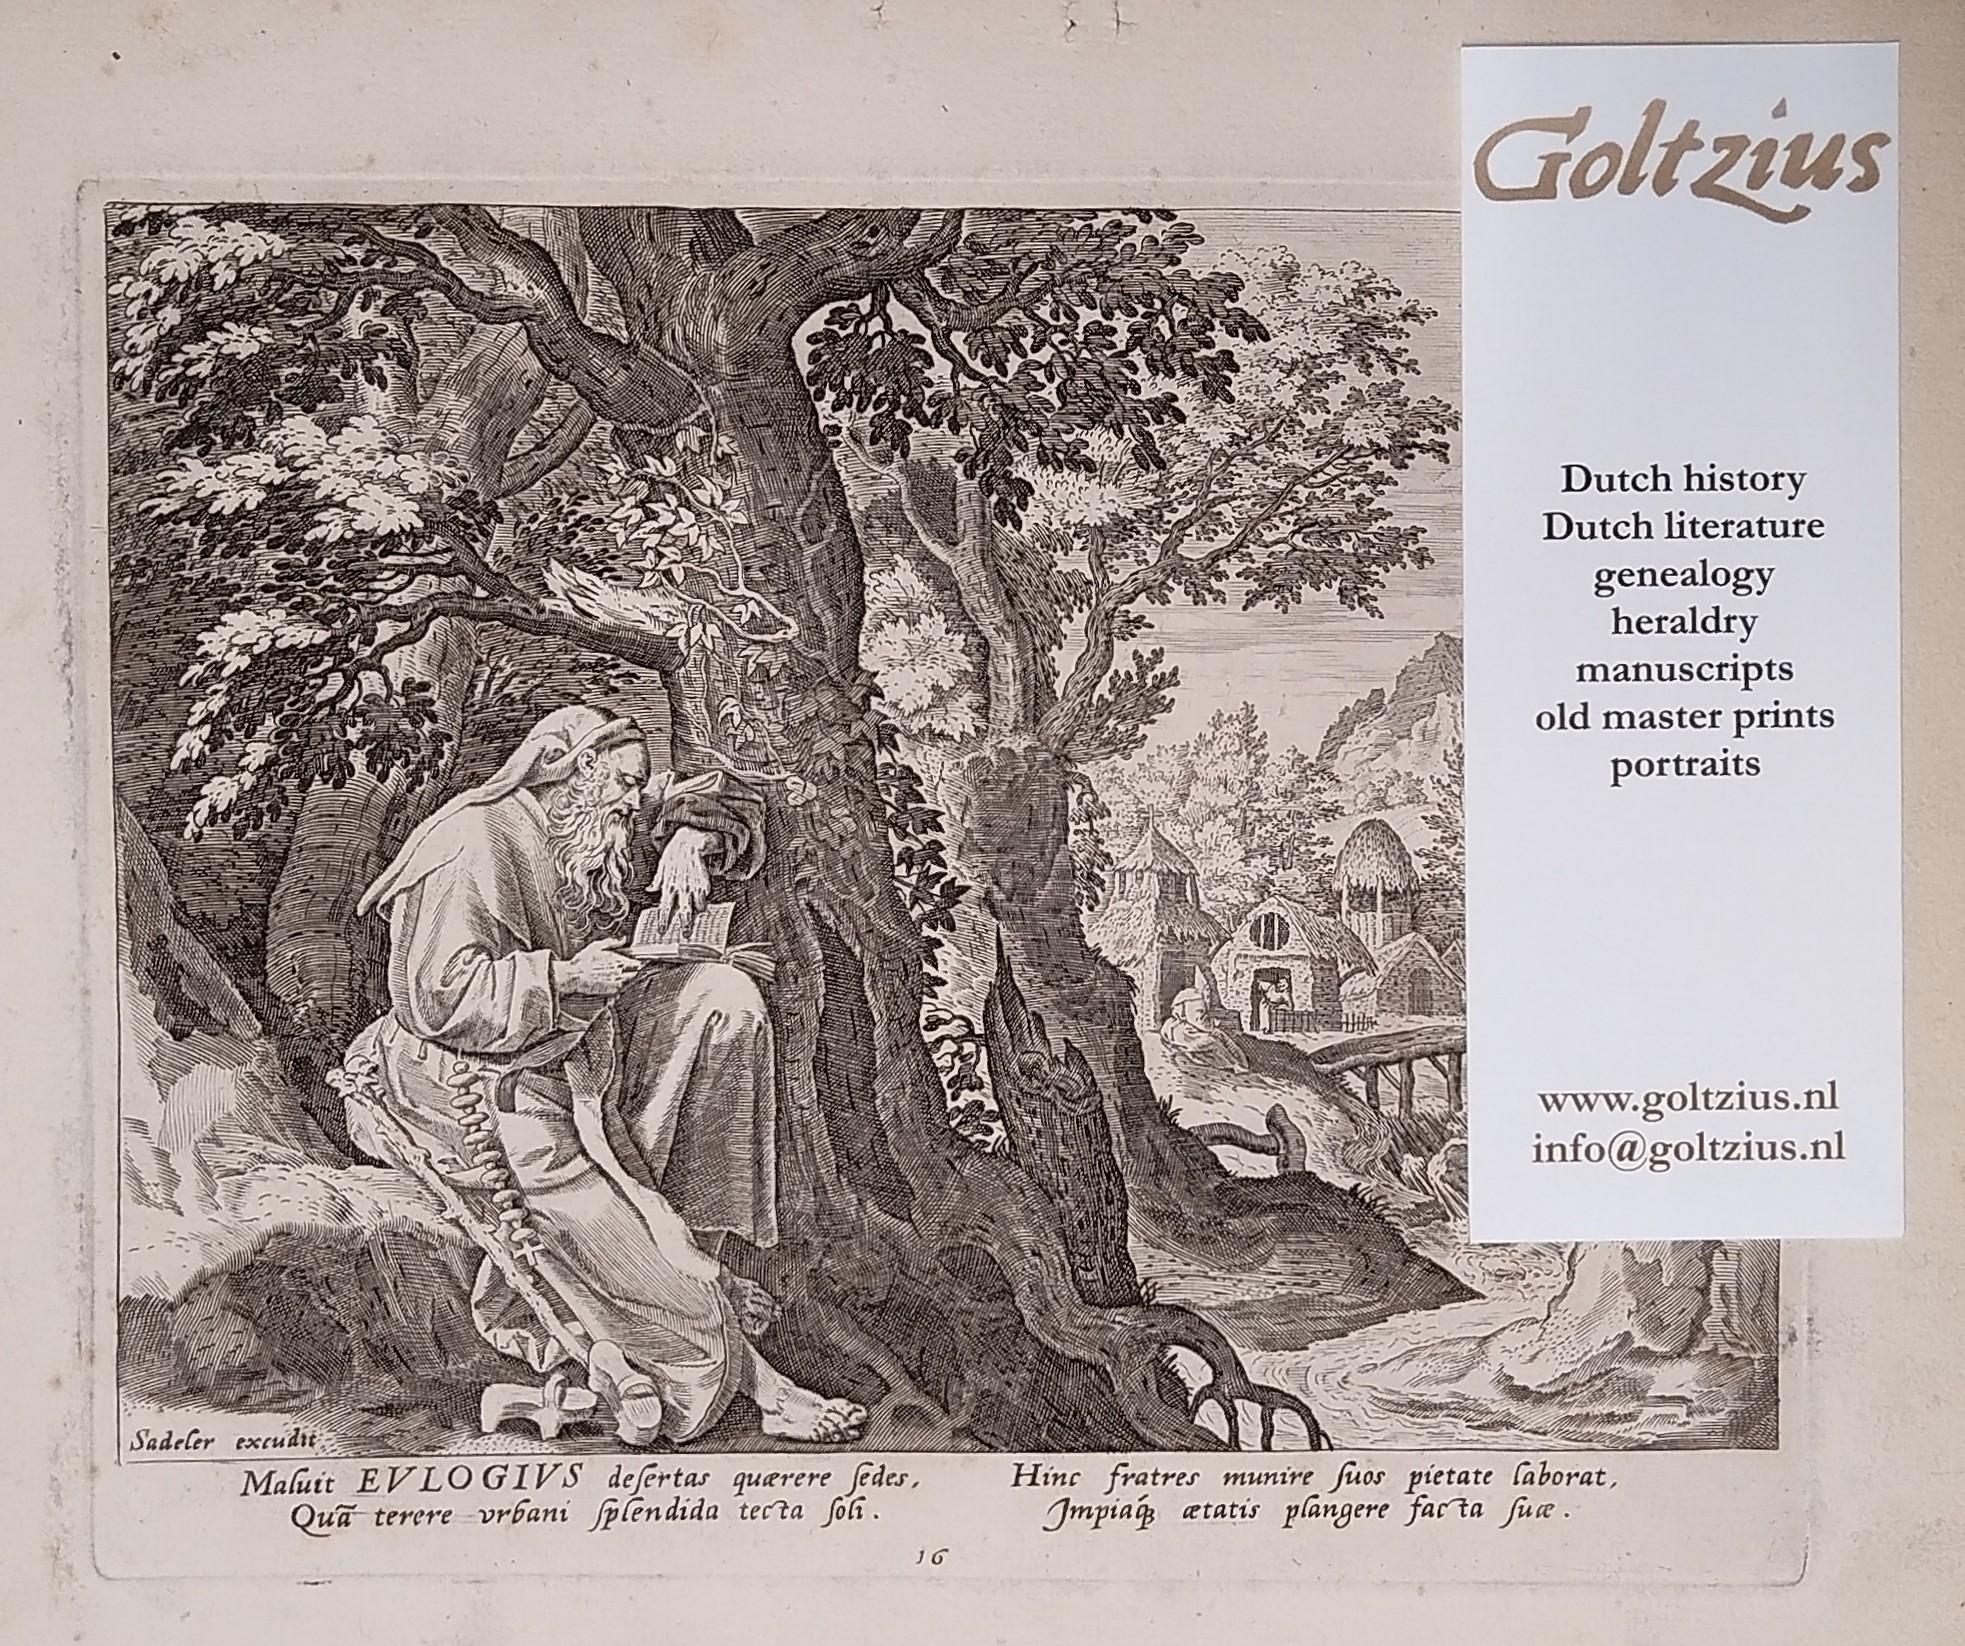 Sadeler, Raphael I (1560-1632) and Sadeler, Johannes I (1550-1600), after Vos, Maarten de (1532-1603) EULOGIUS (nr. 16 from  the serie SOLITUDO SIVE VITAE PATRUM EREMICOLARUM)